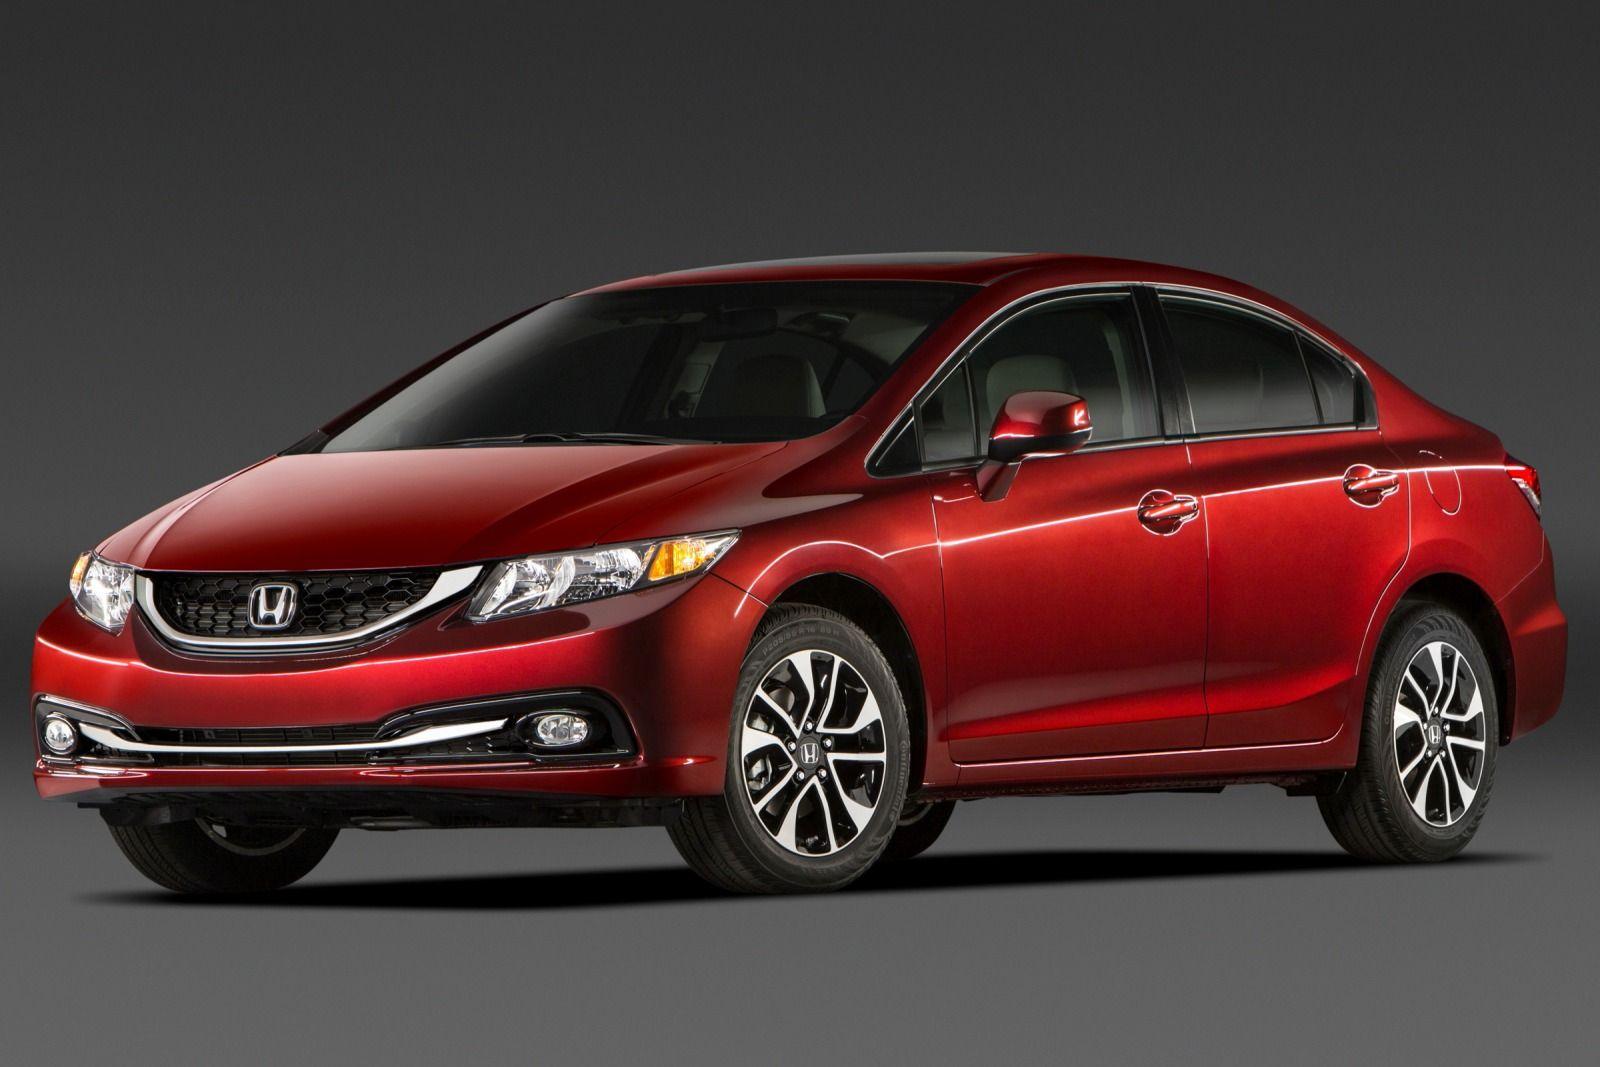 2015 Honda Civic Renk Seçenekleri